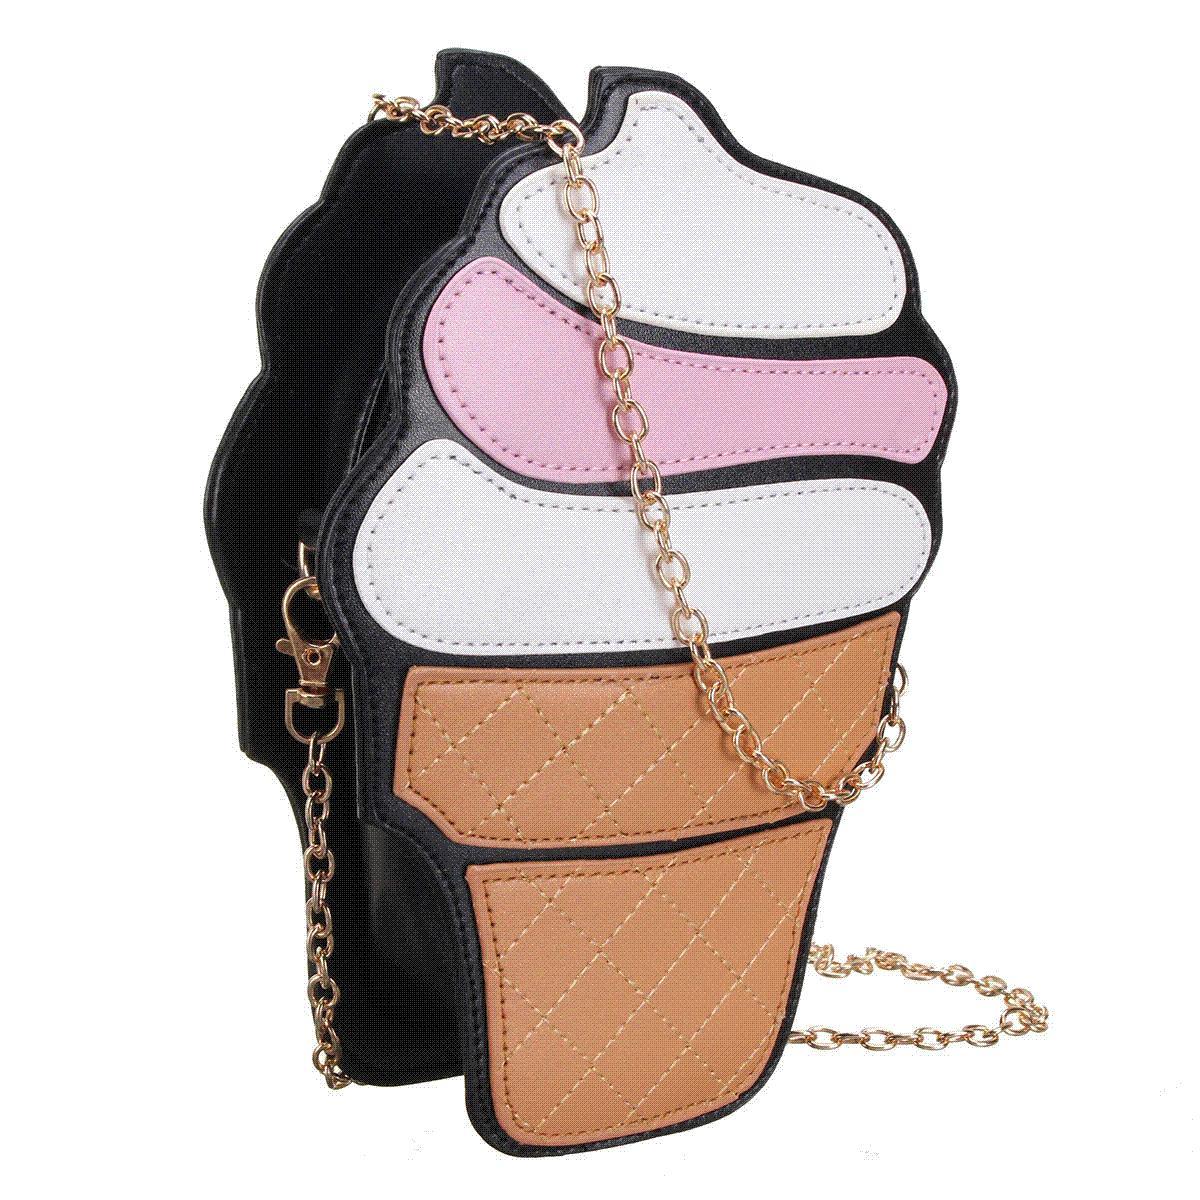 0e009f6c071e New Cute Women Cupcake Ice Cream Shape Crossbody Bags Cartoon Fashion Chain  PU Leather Ladies Small Mini Shoulder Bag Feminine Relic Purses Fashion  Bags ...